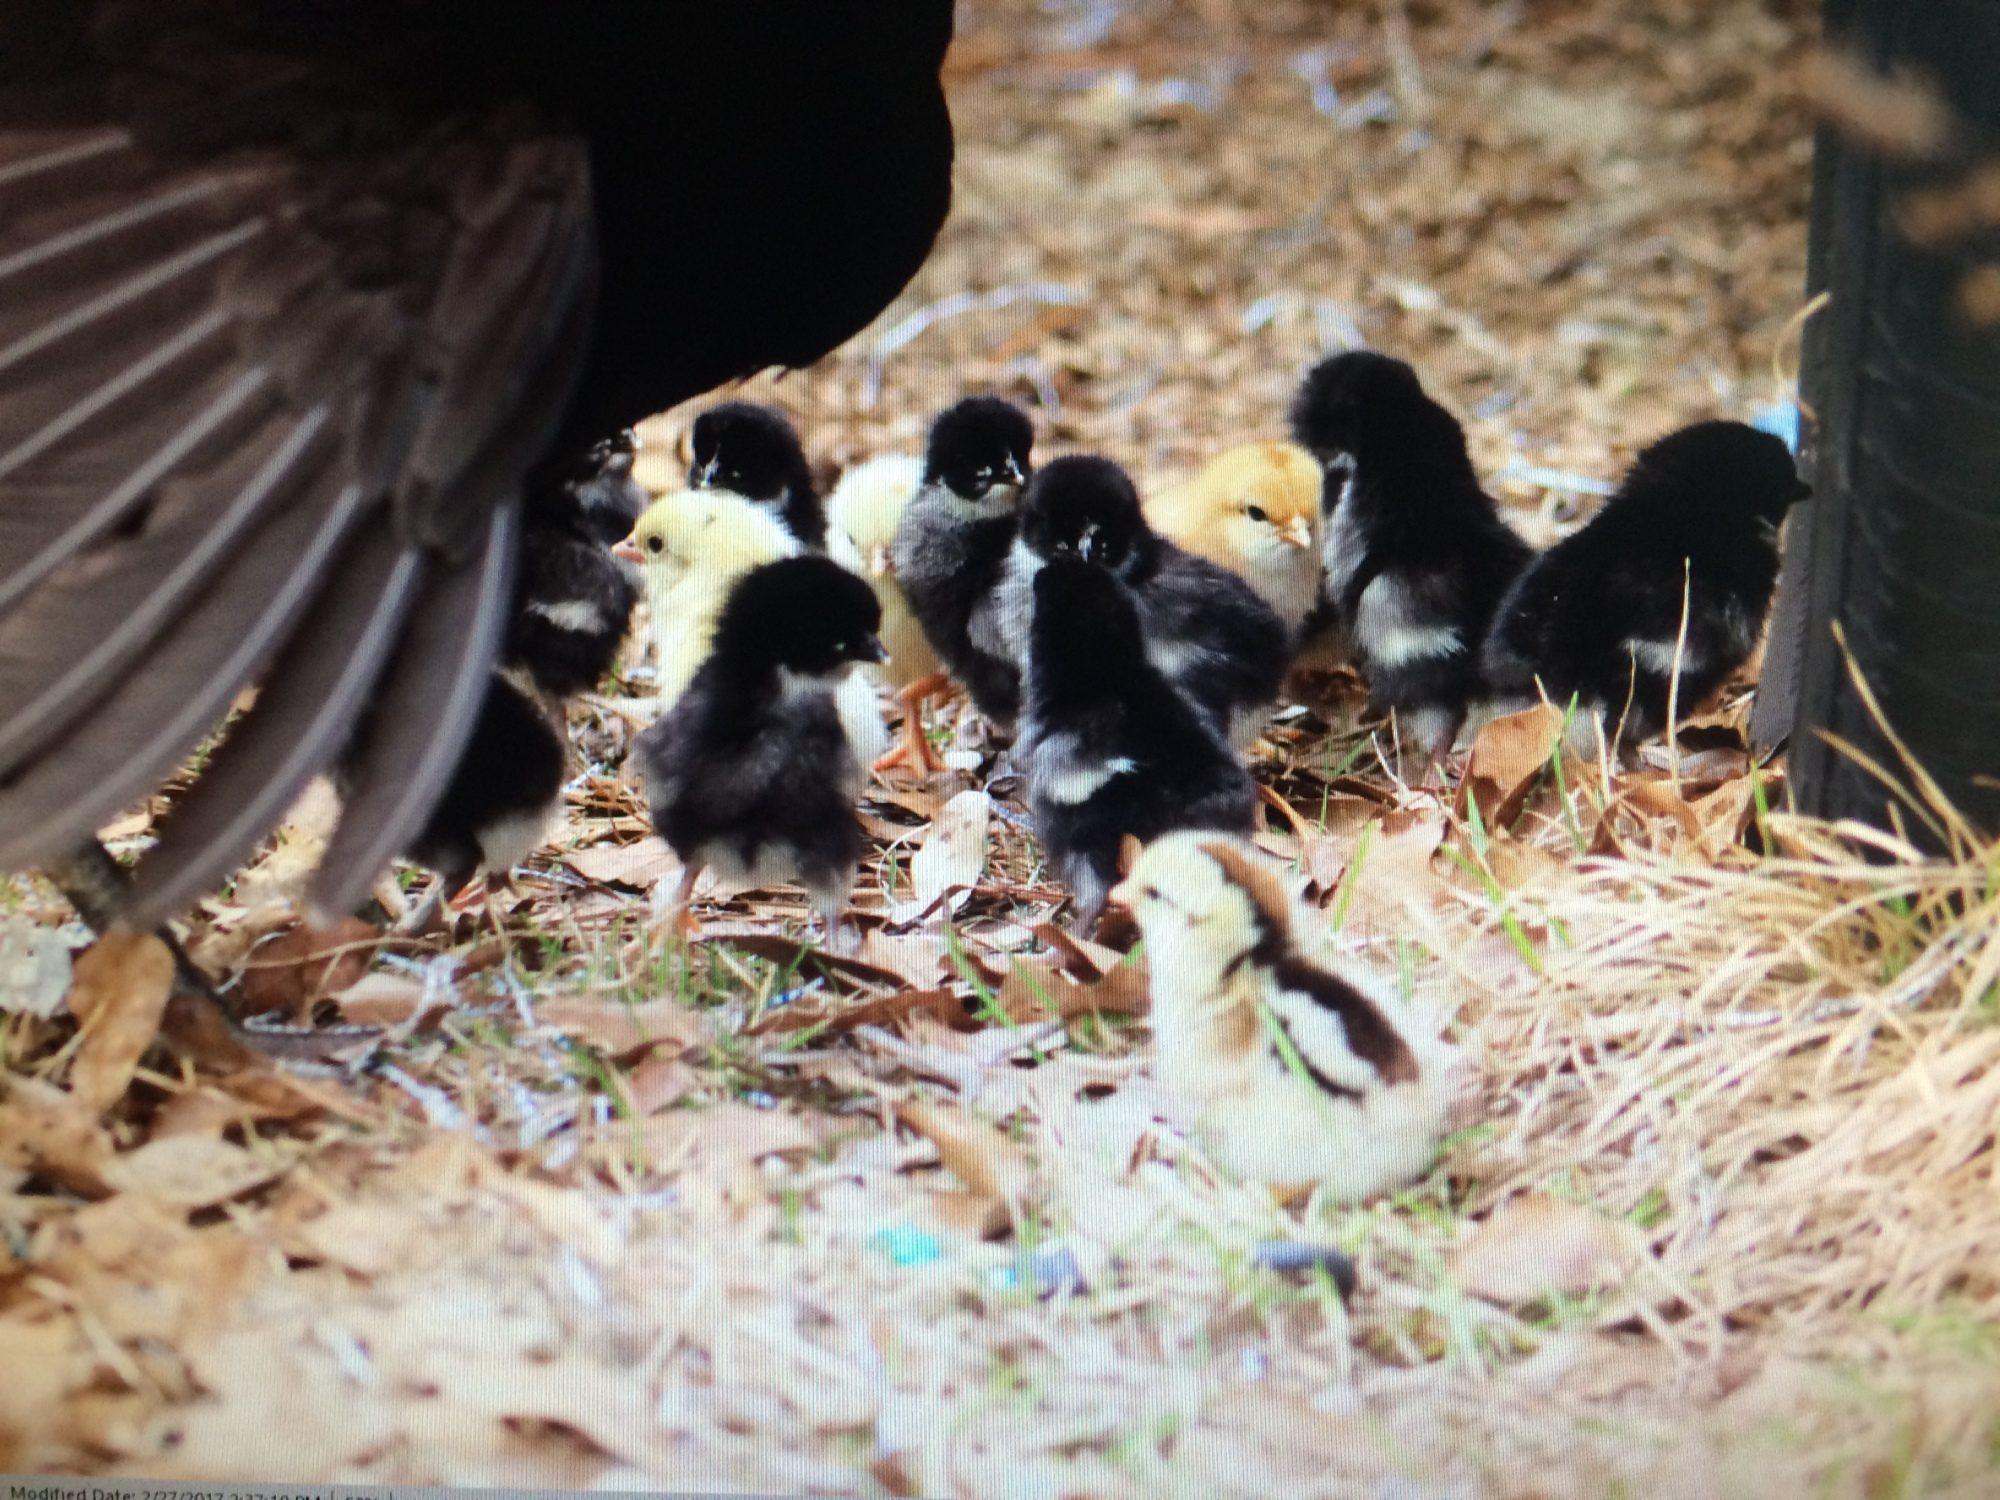 Surprise chicks!